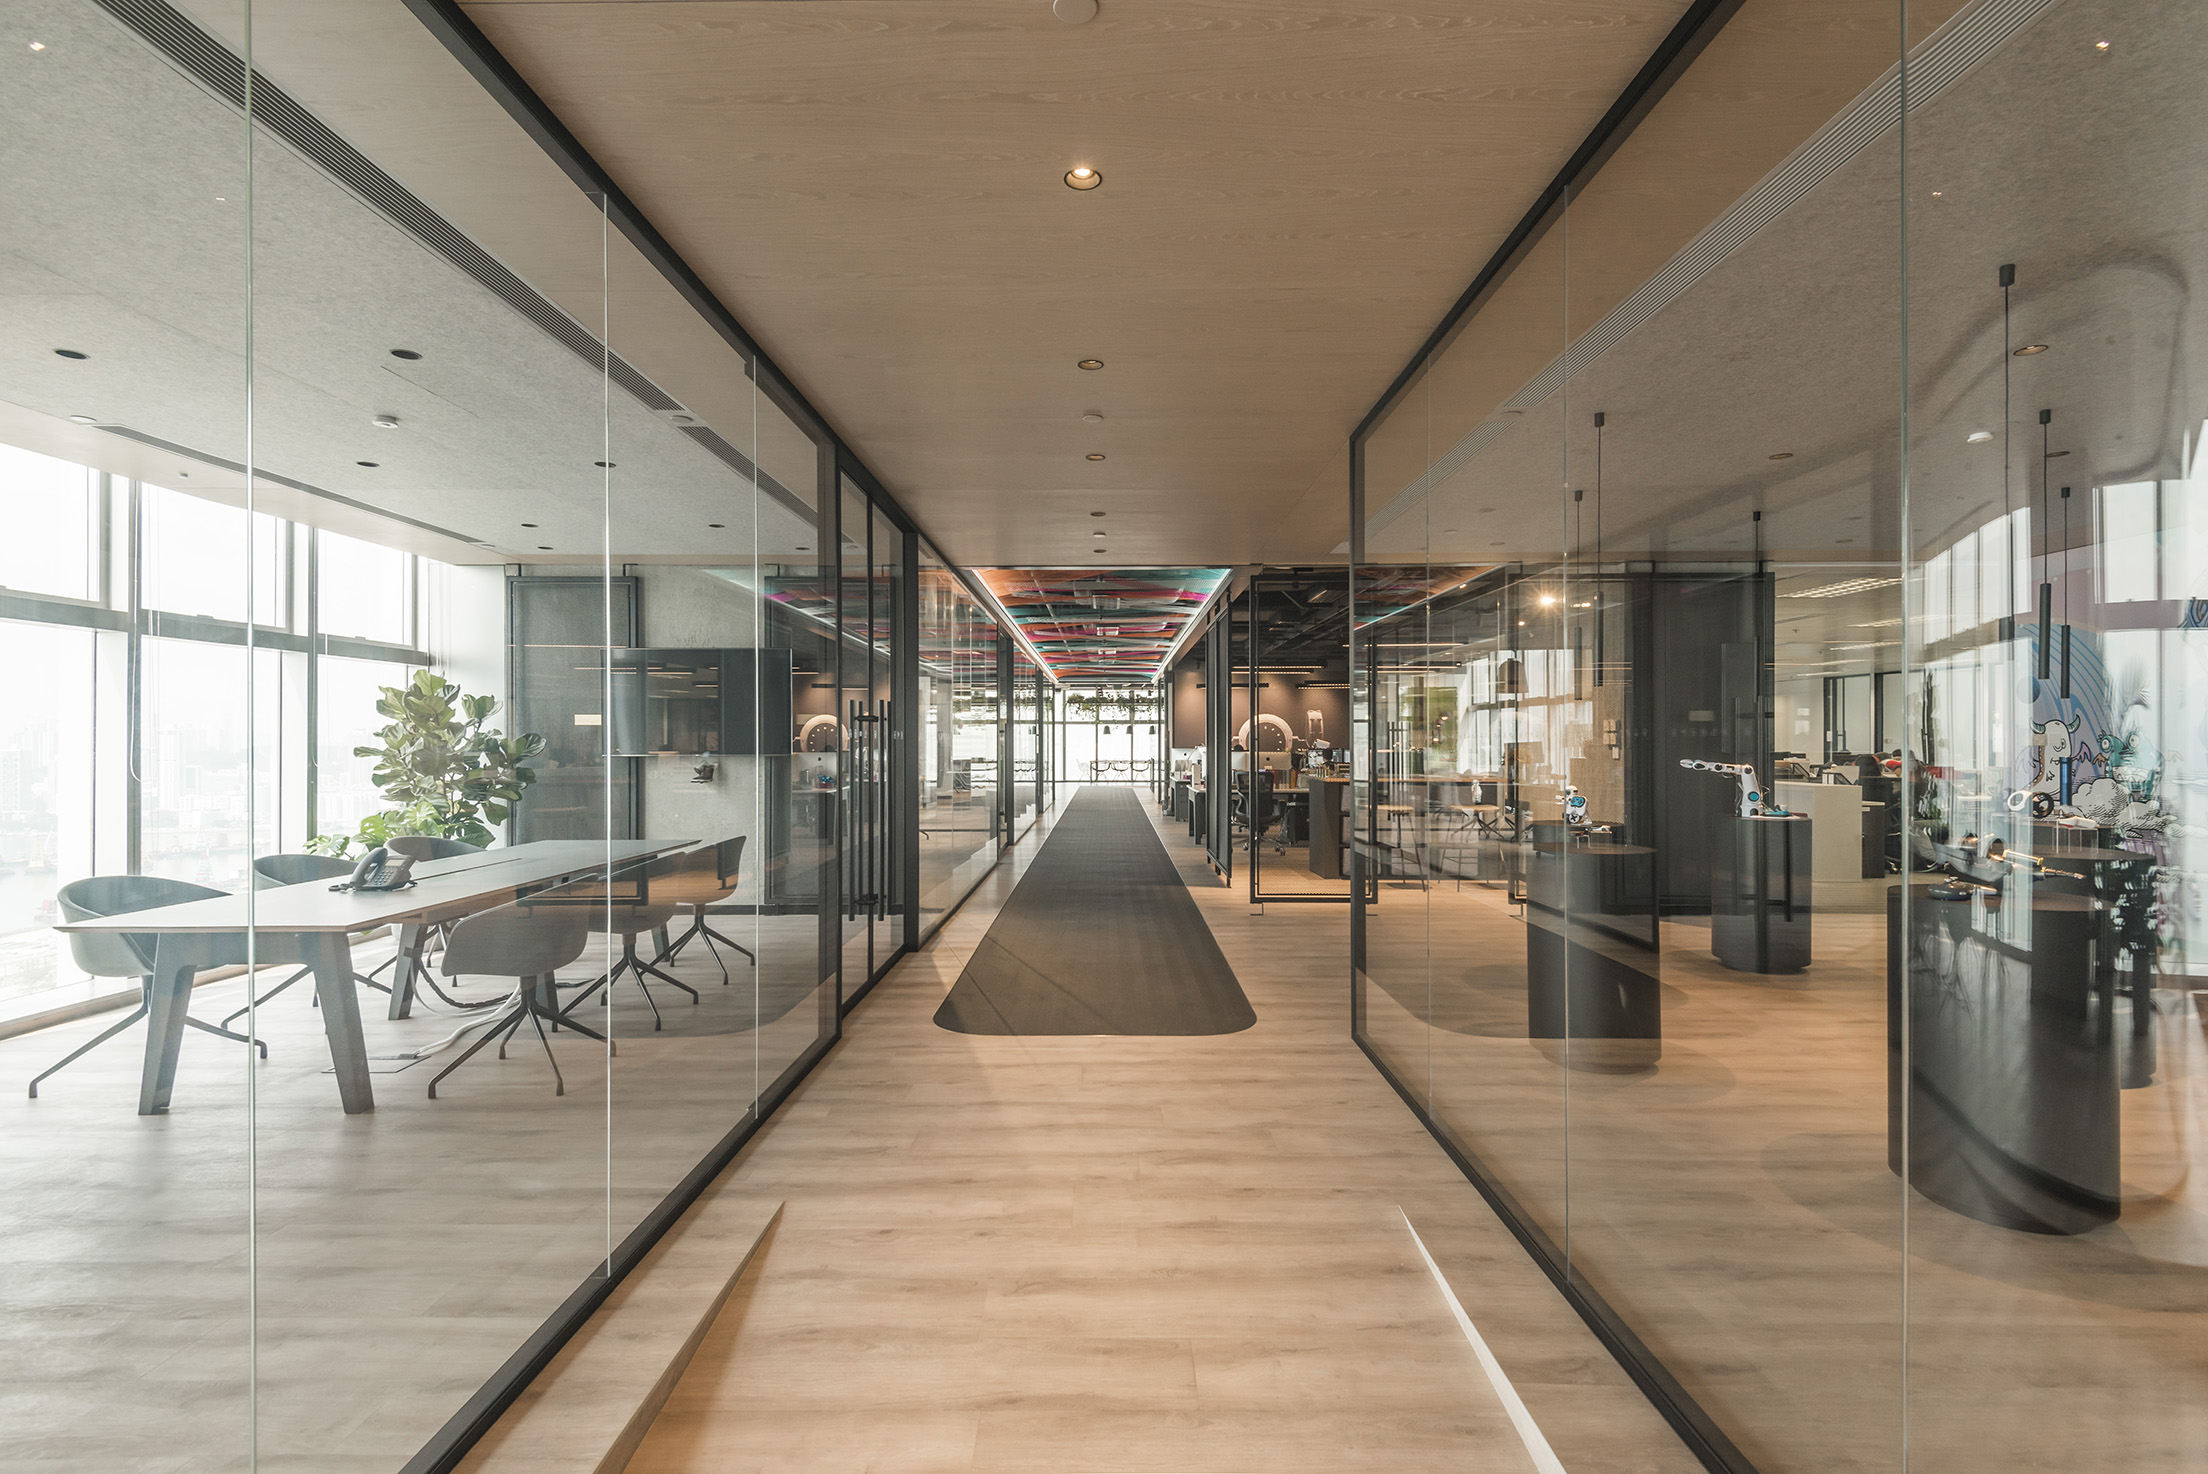 jeb-partitions-summit-threesixty-office-hk-02.jpg